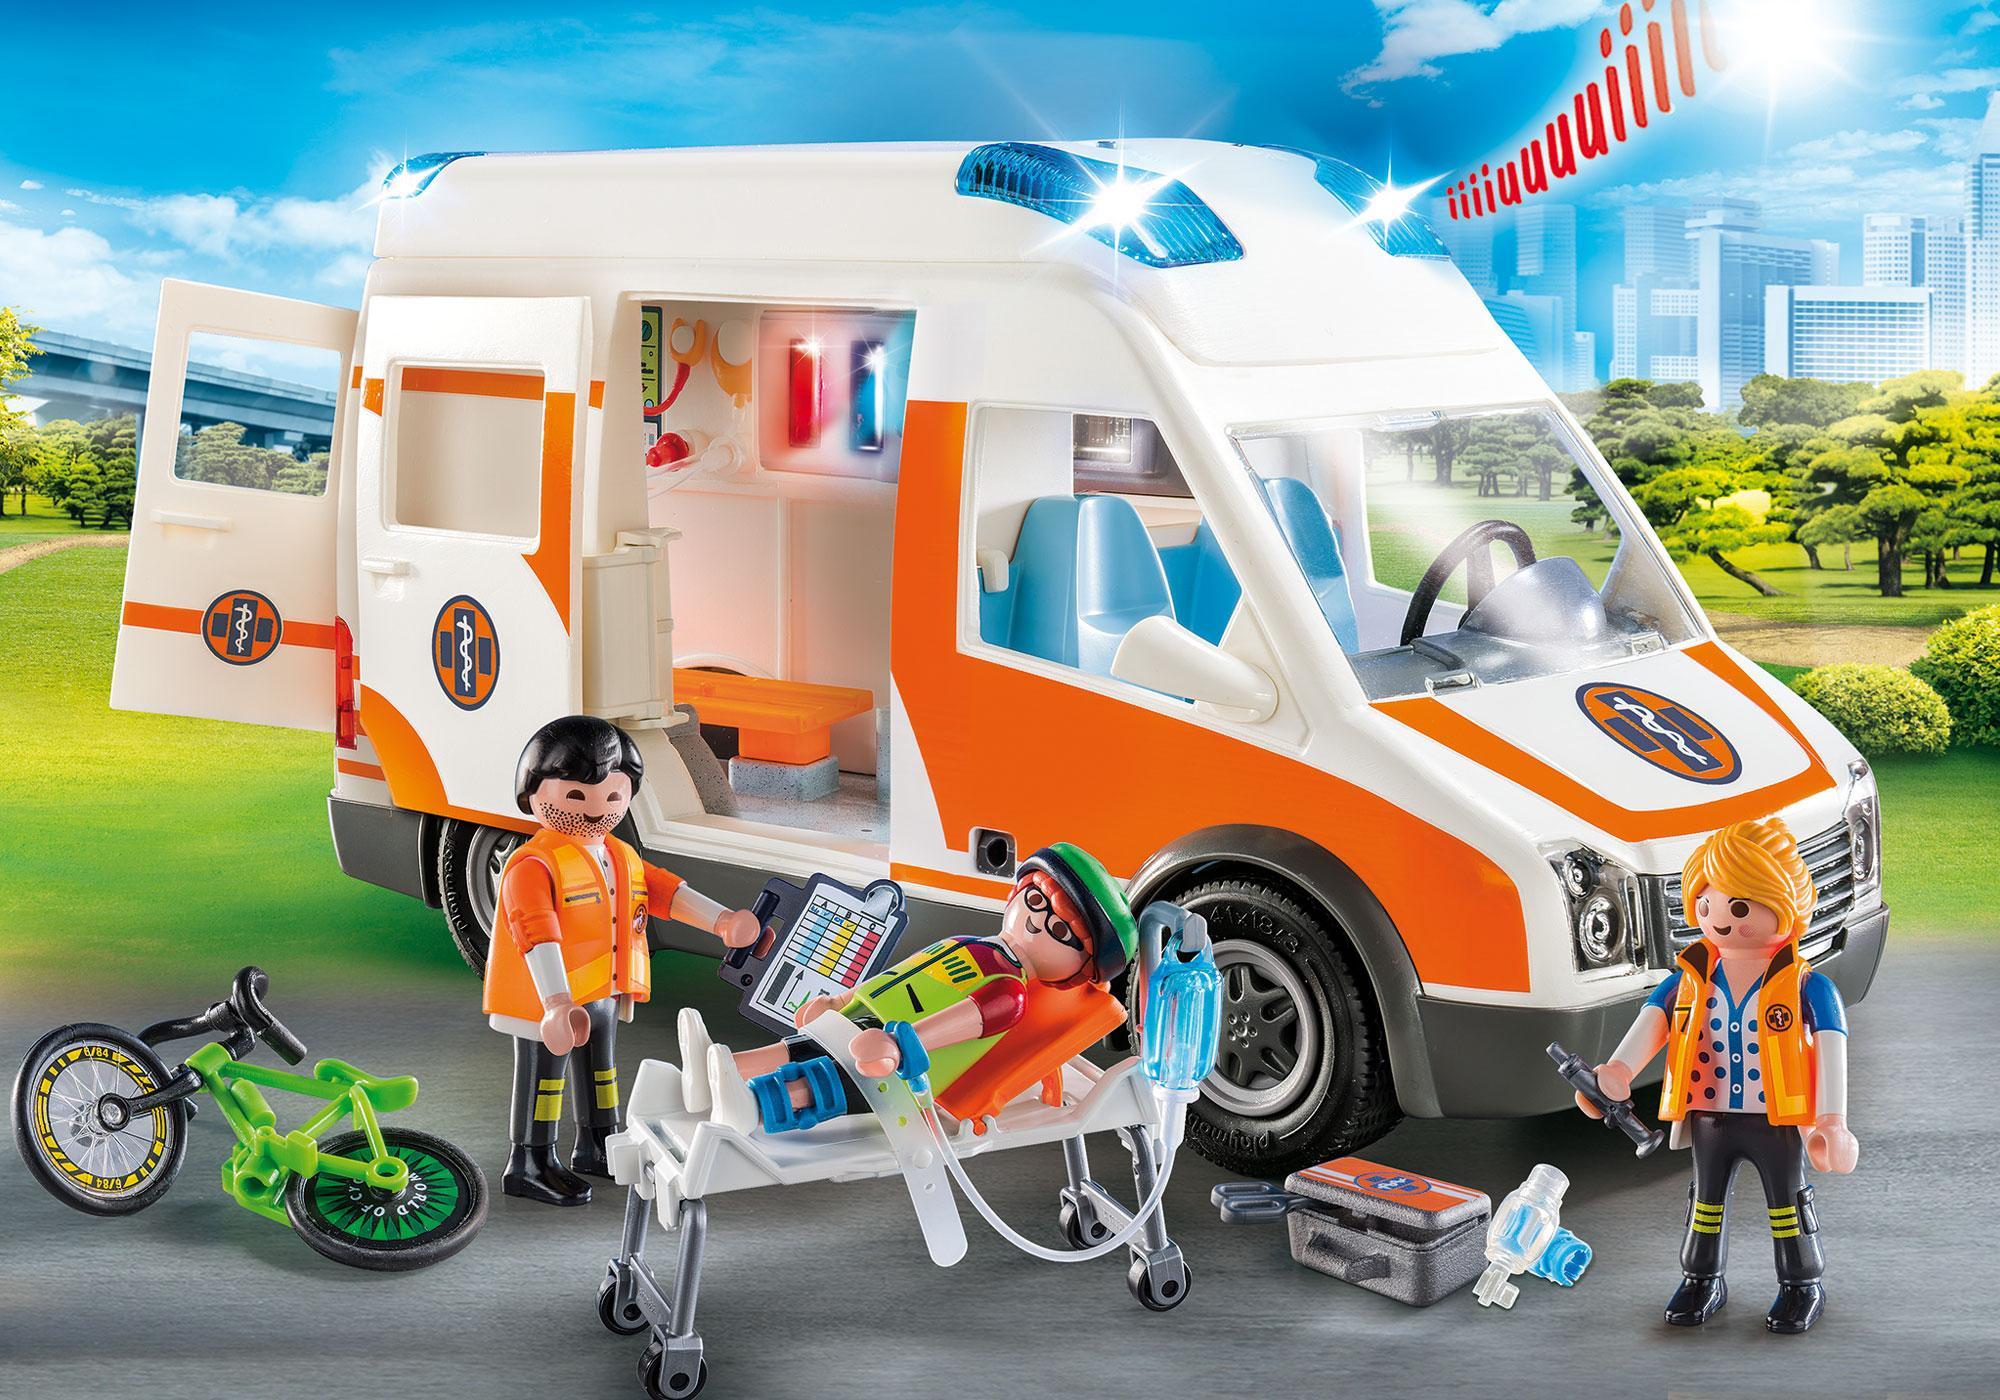 70049_product_detail/Ambulance with Flashing Lights